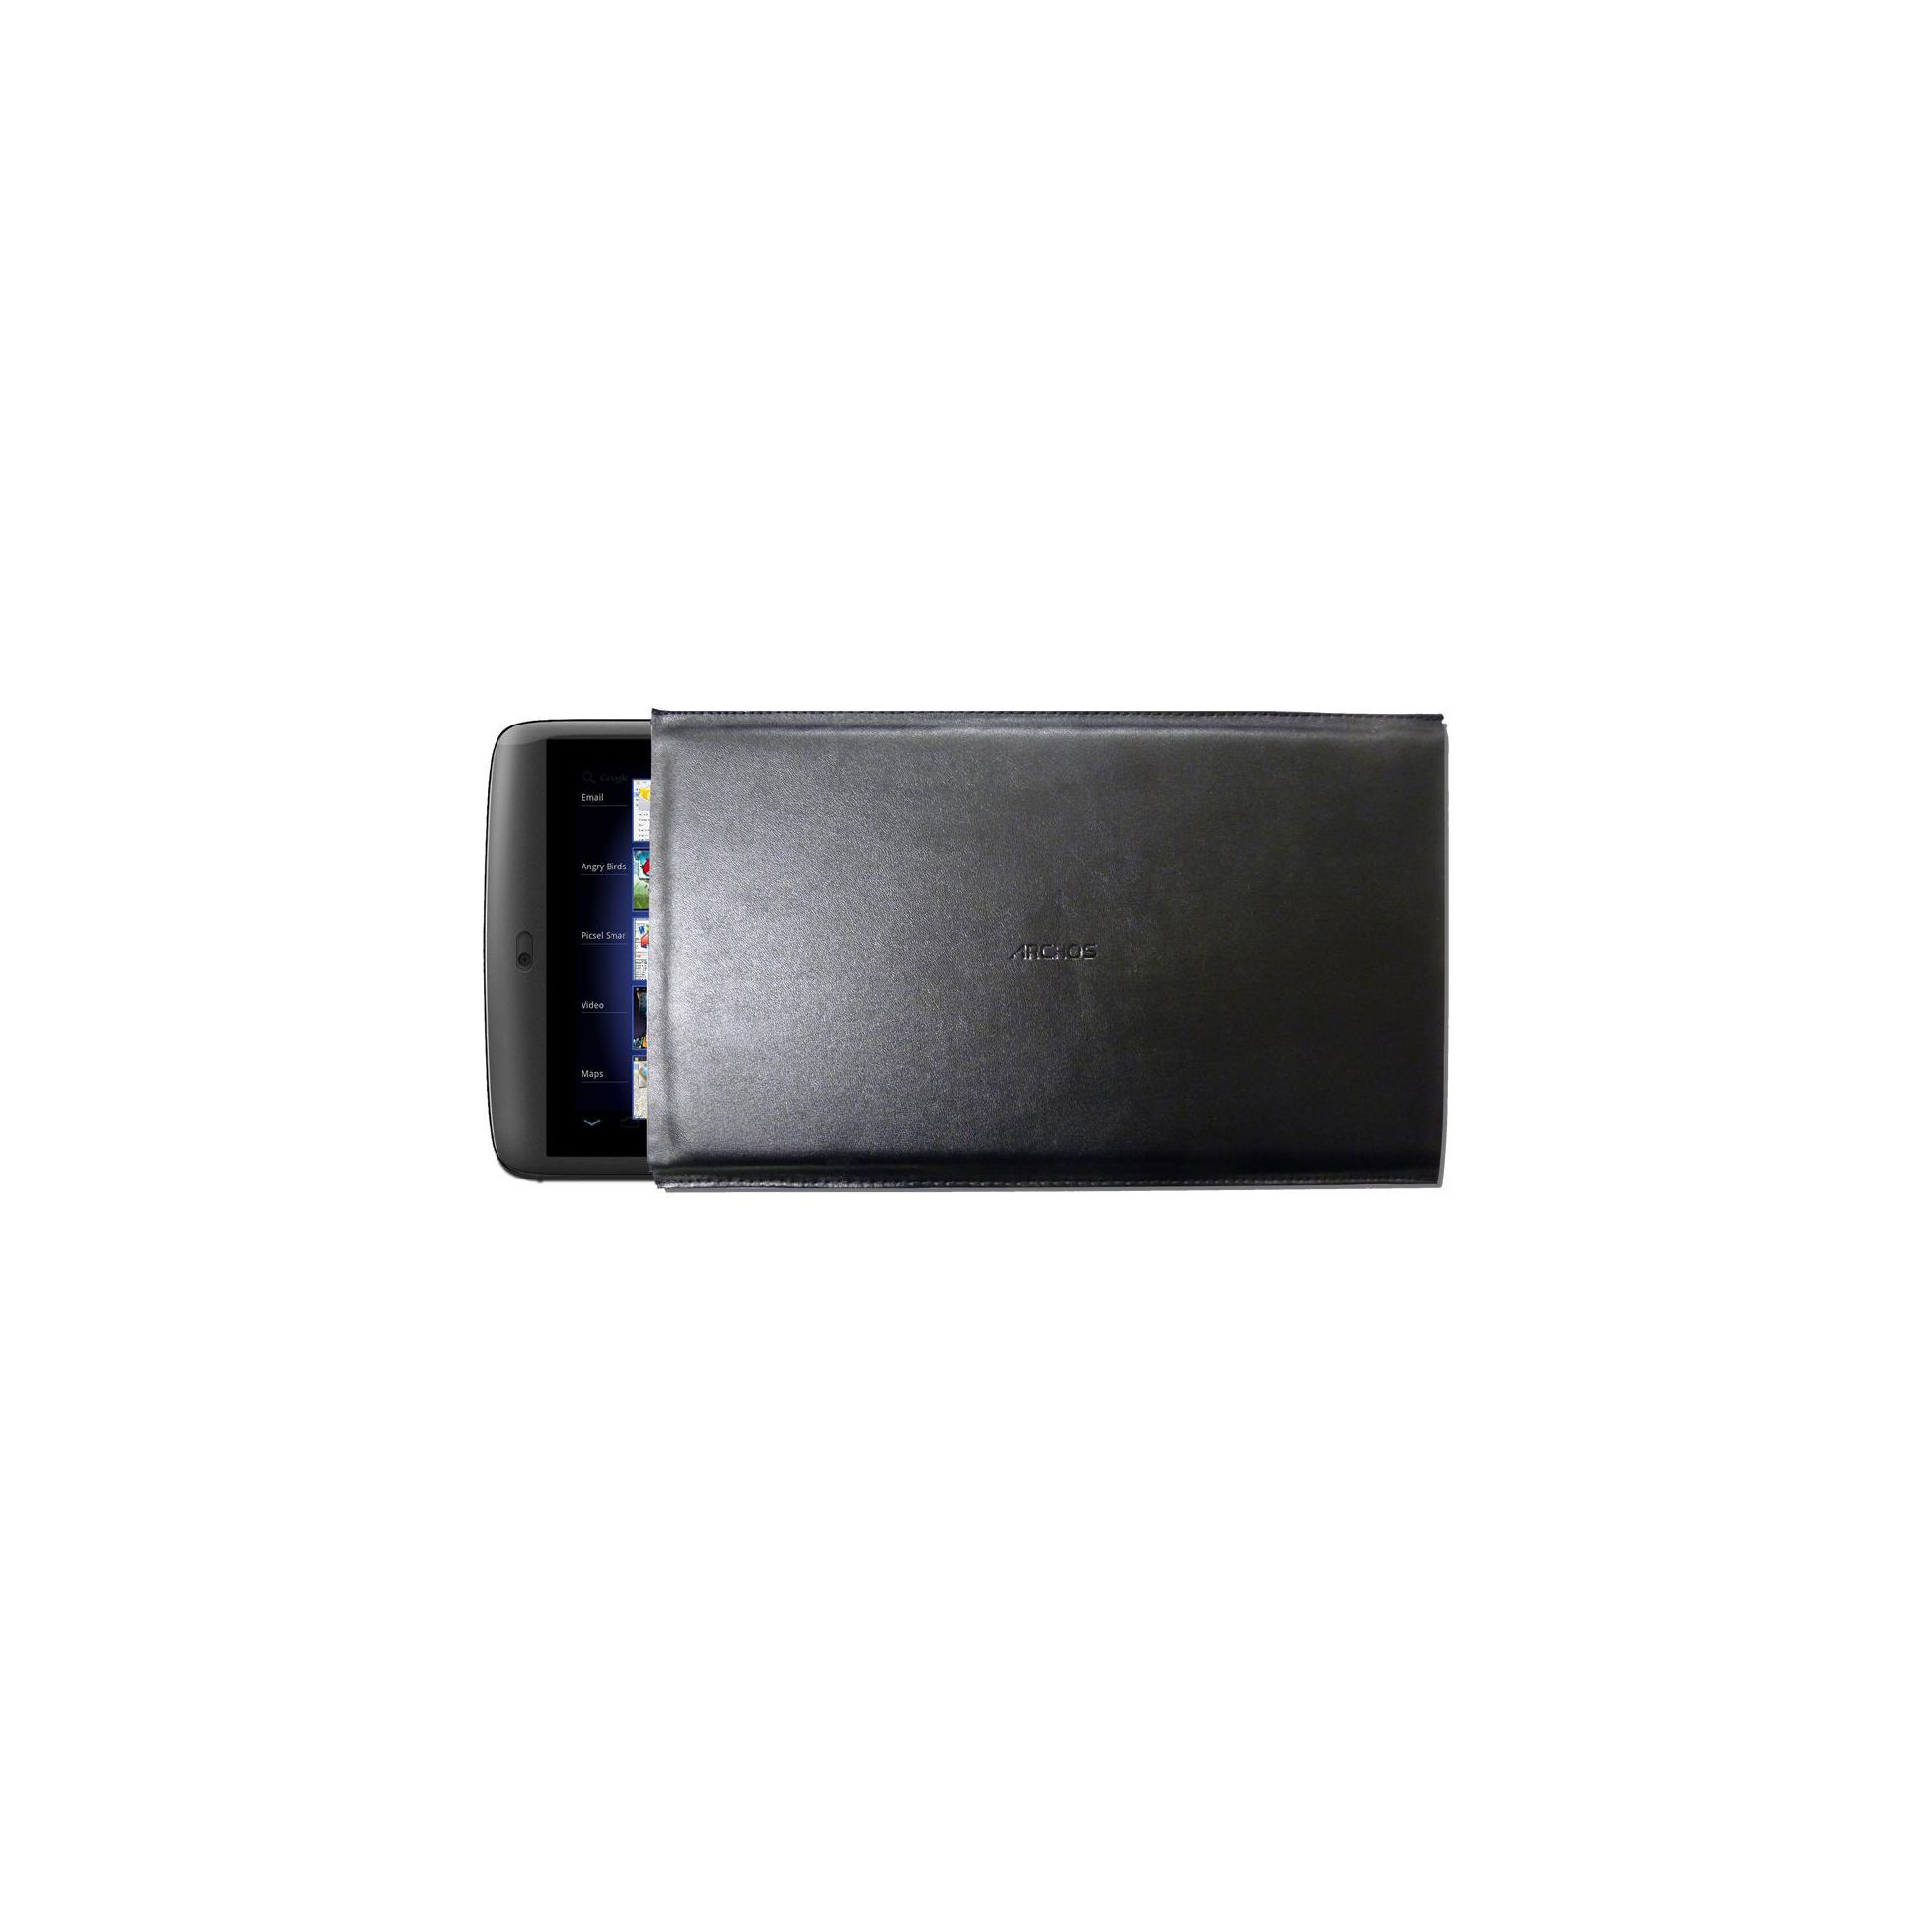 archos-protective-case-for-archos-7-tablets